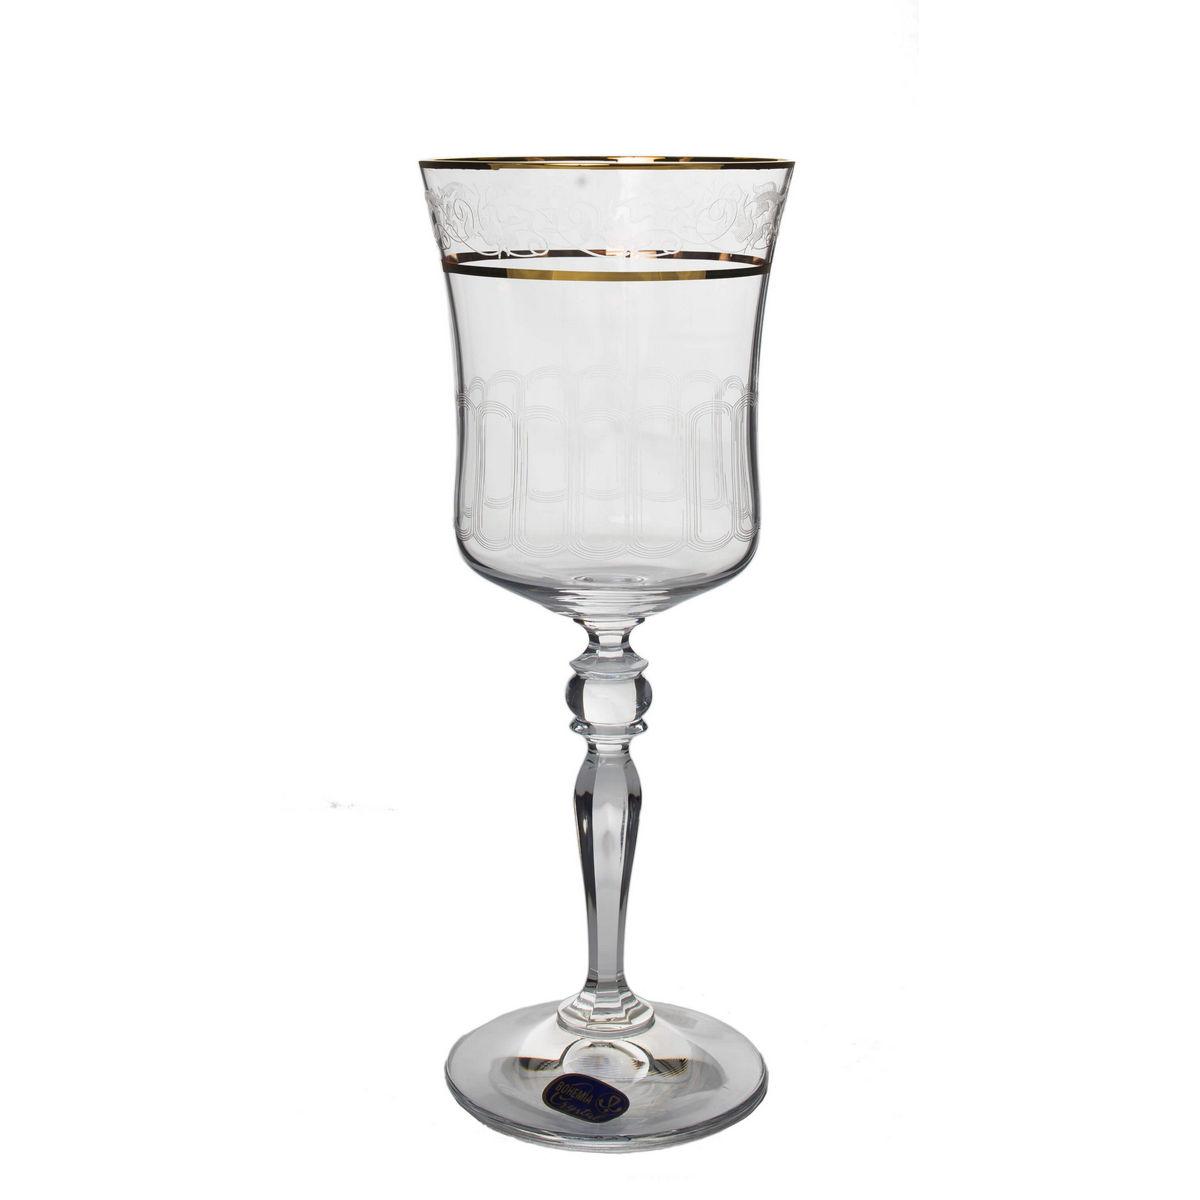 Grace Set 6 Pahare Cristalin Decor Aur Vin 300 Ml 2021 aranjareamesei.ro